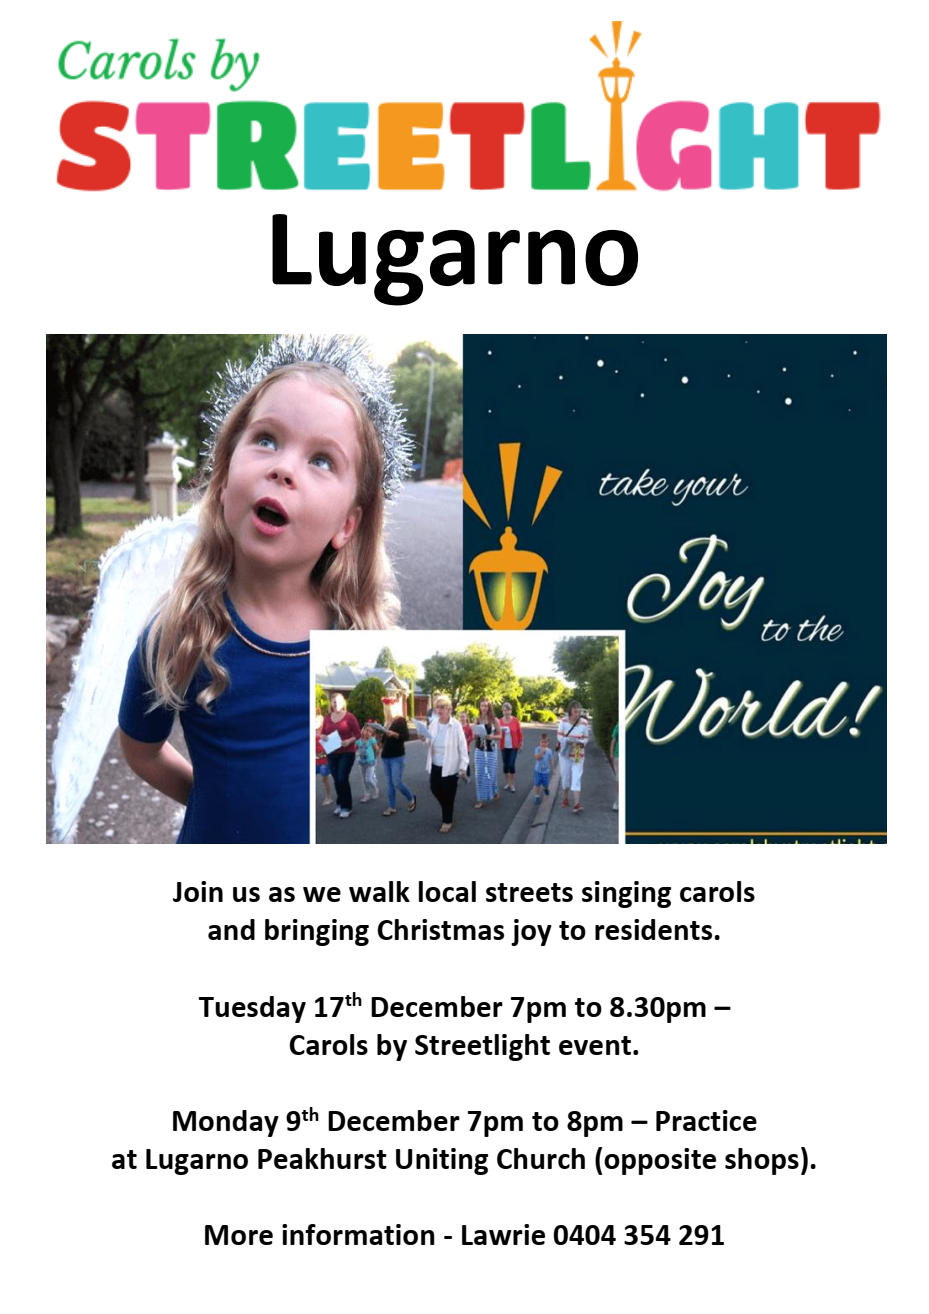 Carols by Streetlight - Event @ Lugarno Peakhurst Uniting Church